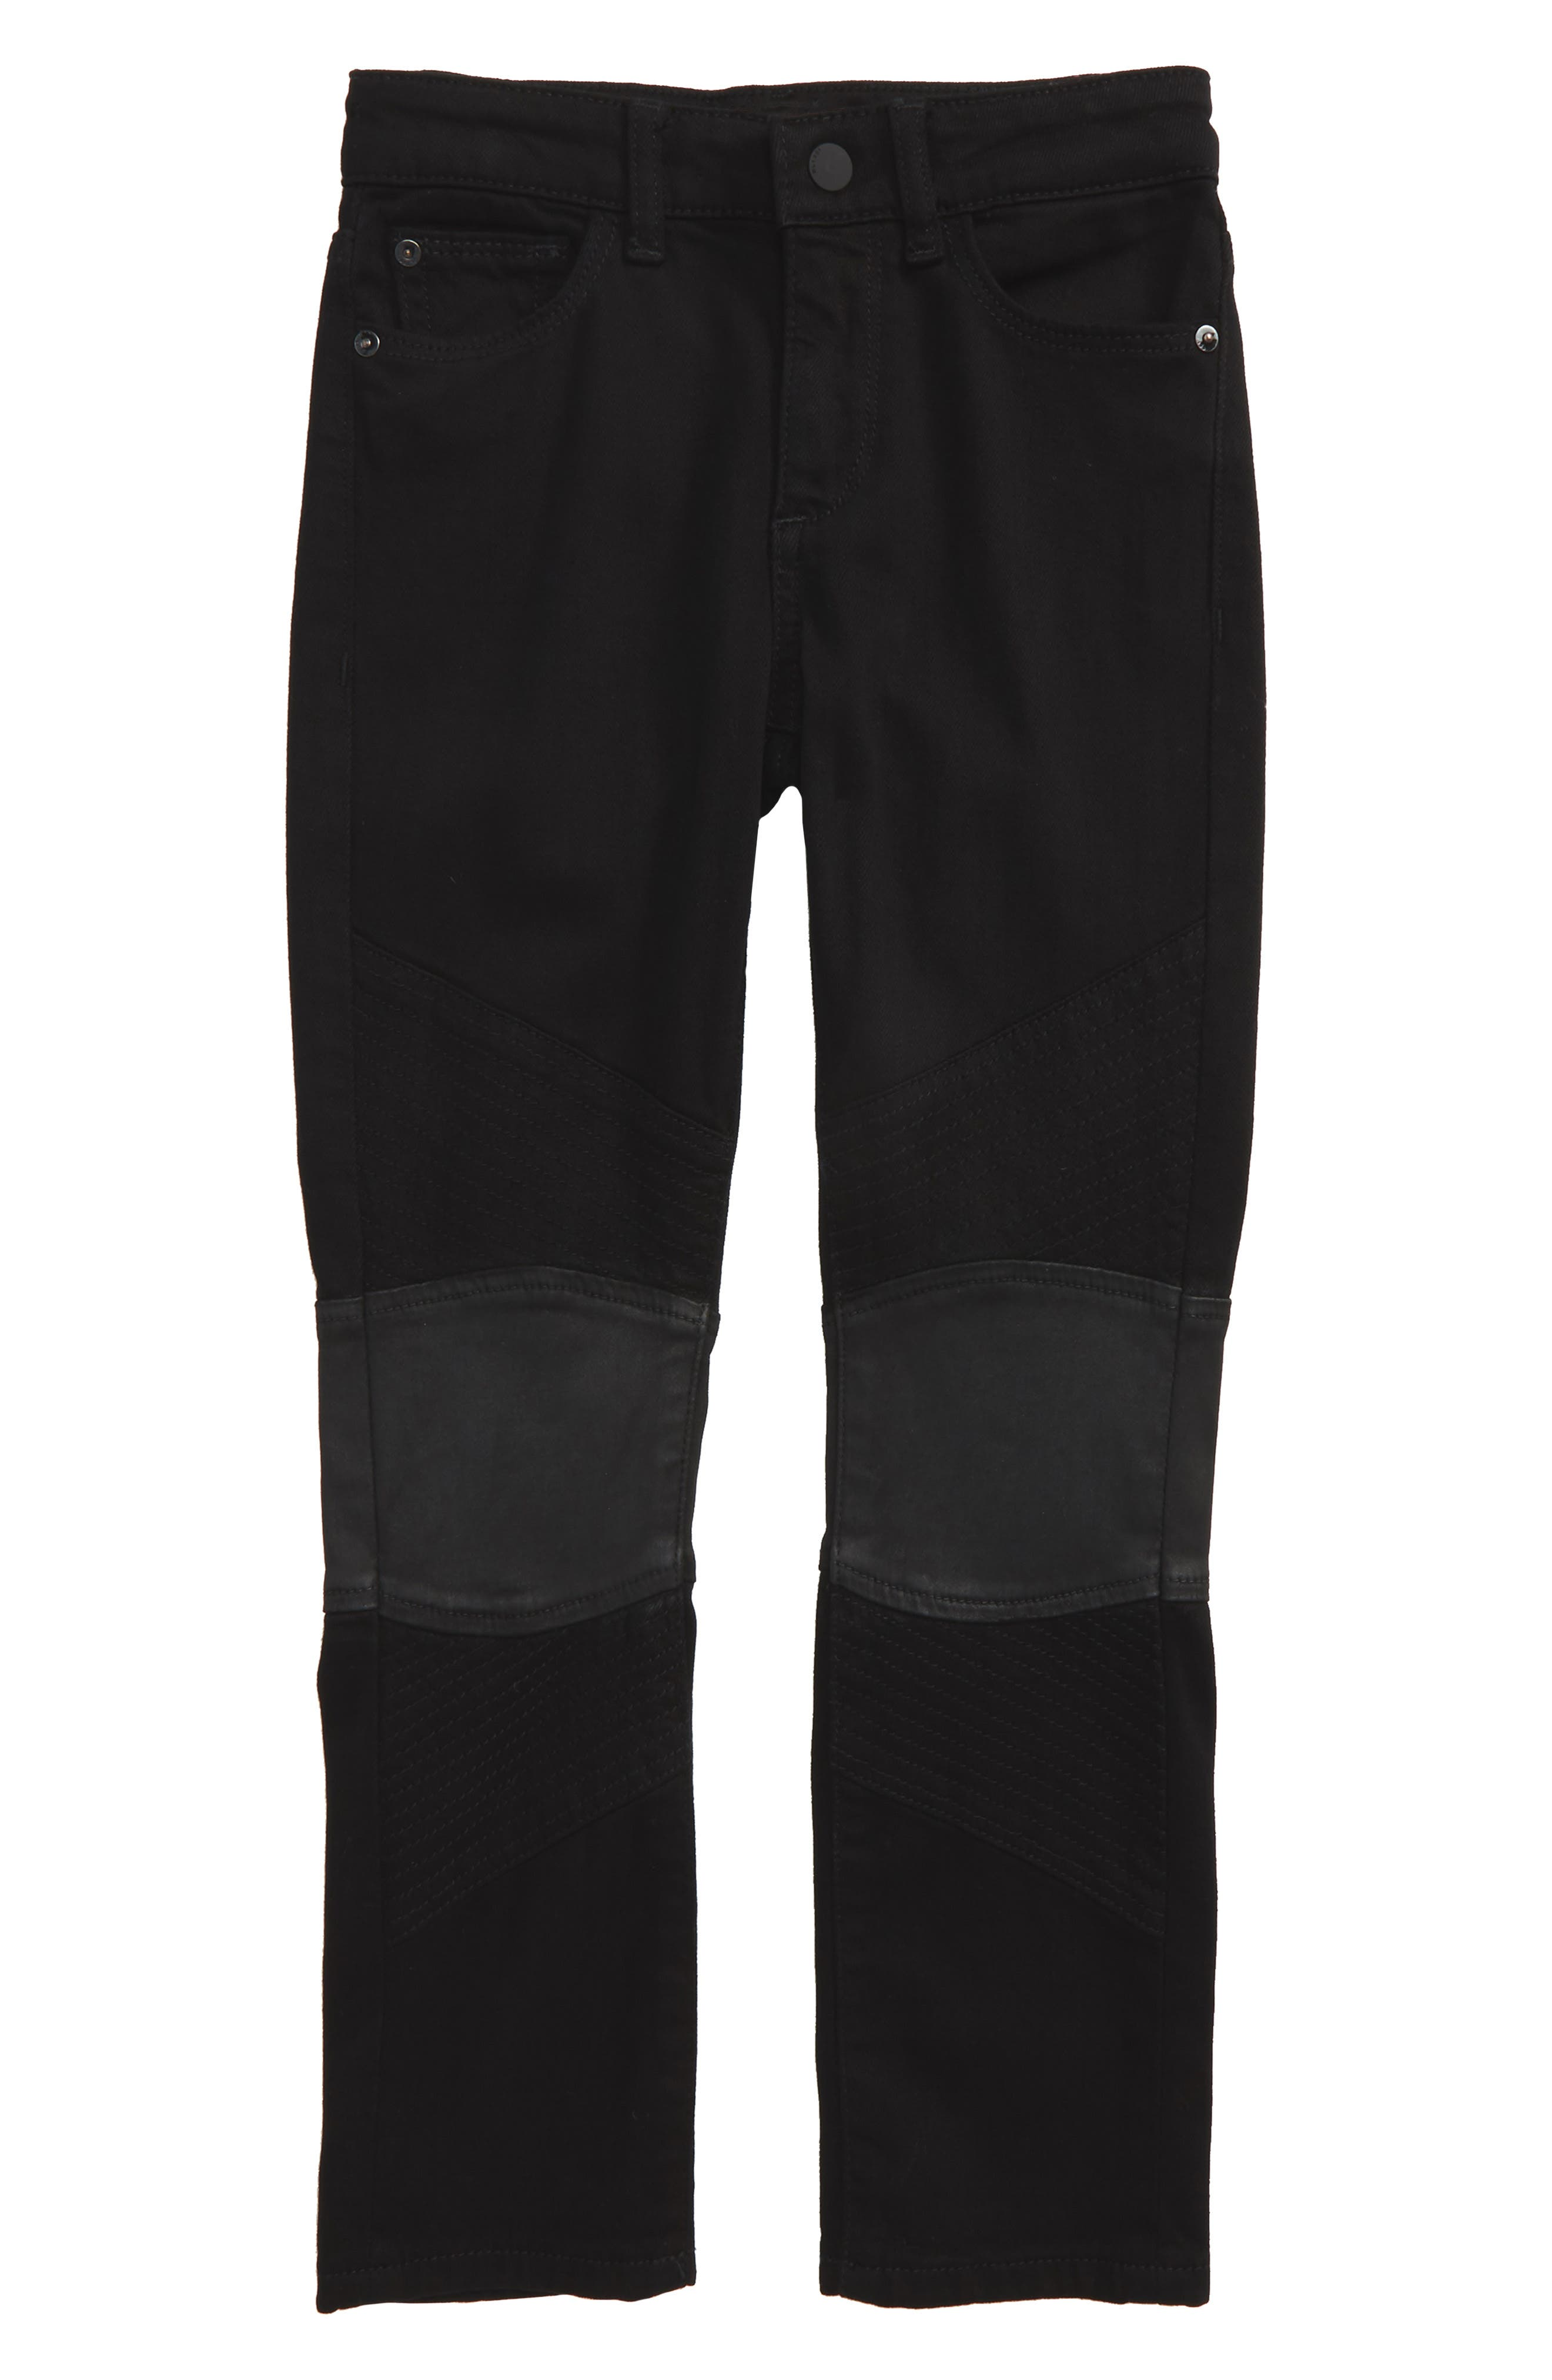 Hawke Skinny Moto Jeans,                             Main thumbnail 1, color,                             Wheel